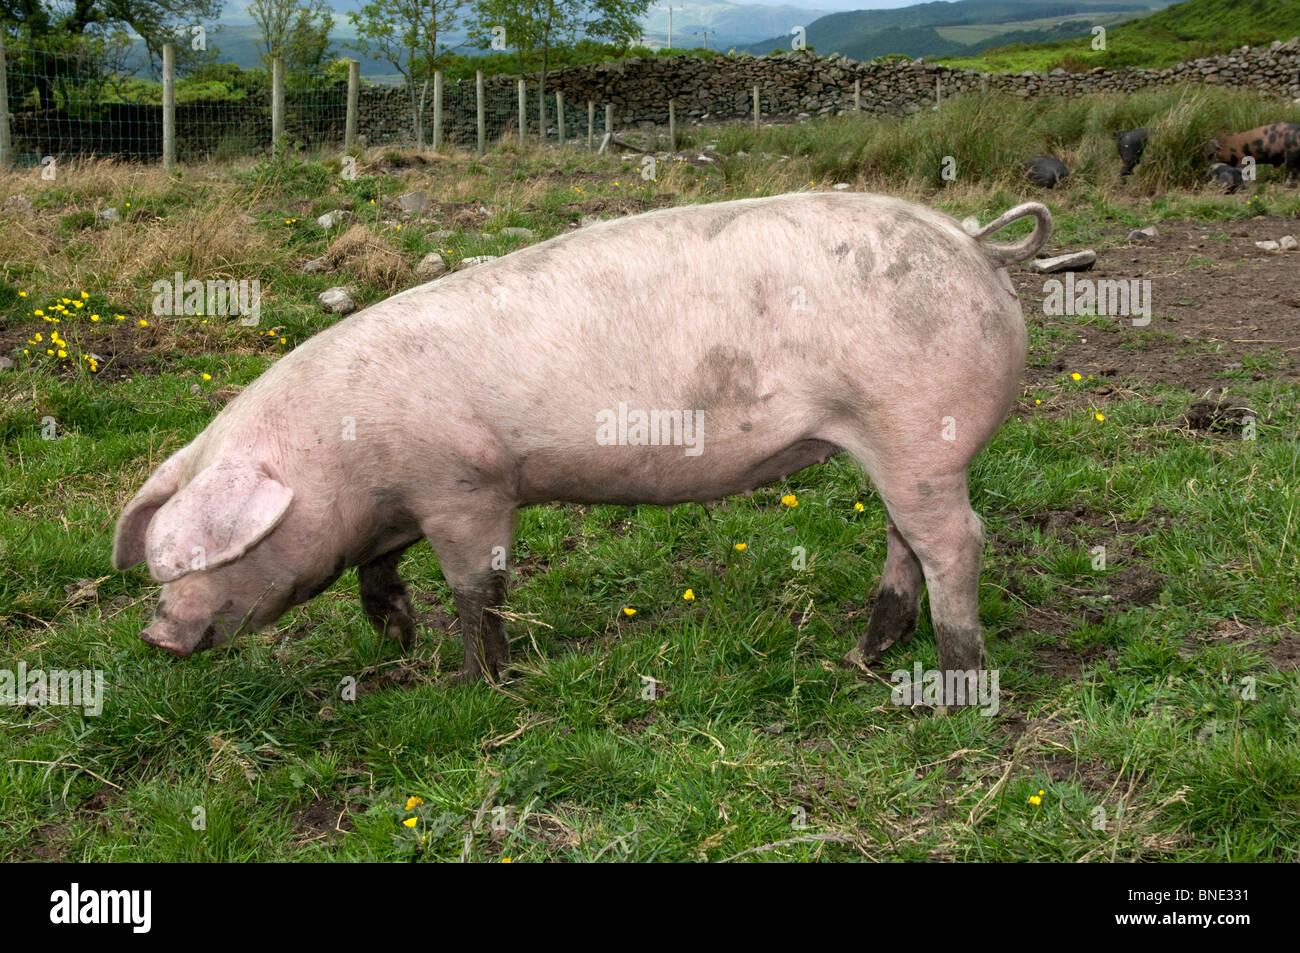 British Lop pig grazing in pasture - Stock Image